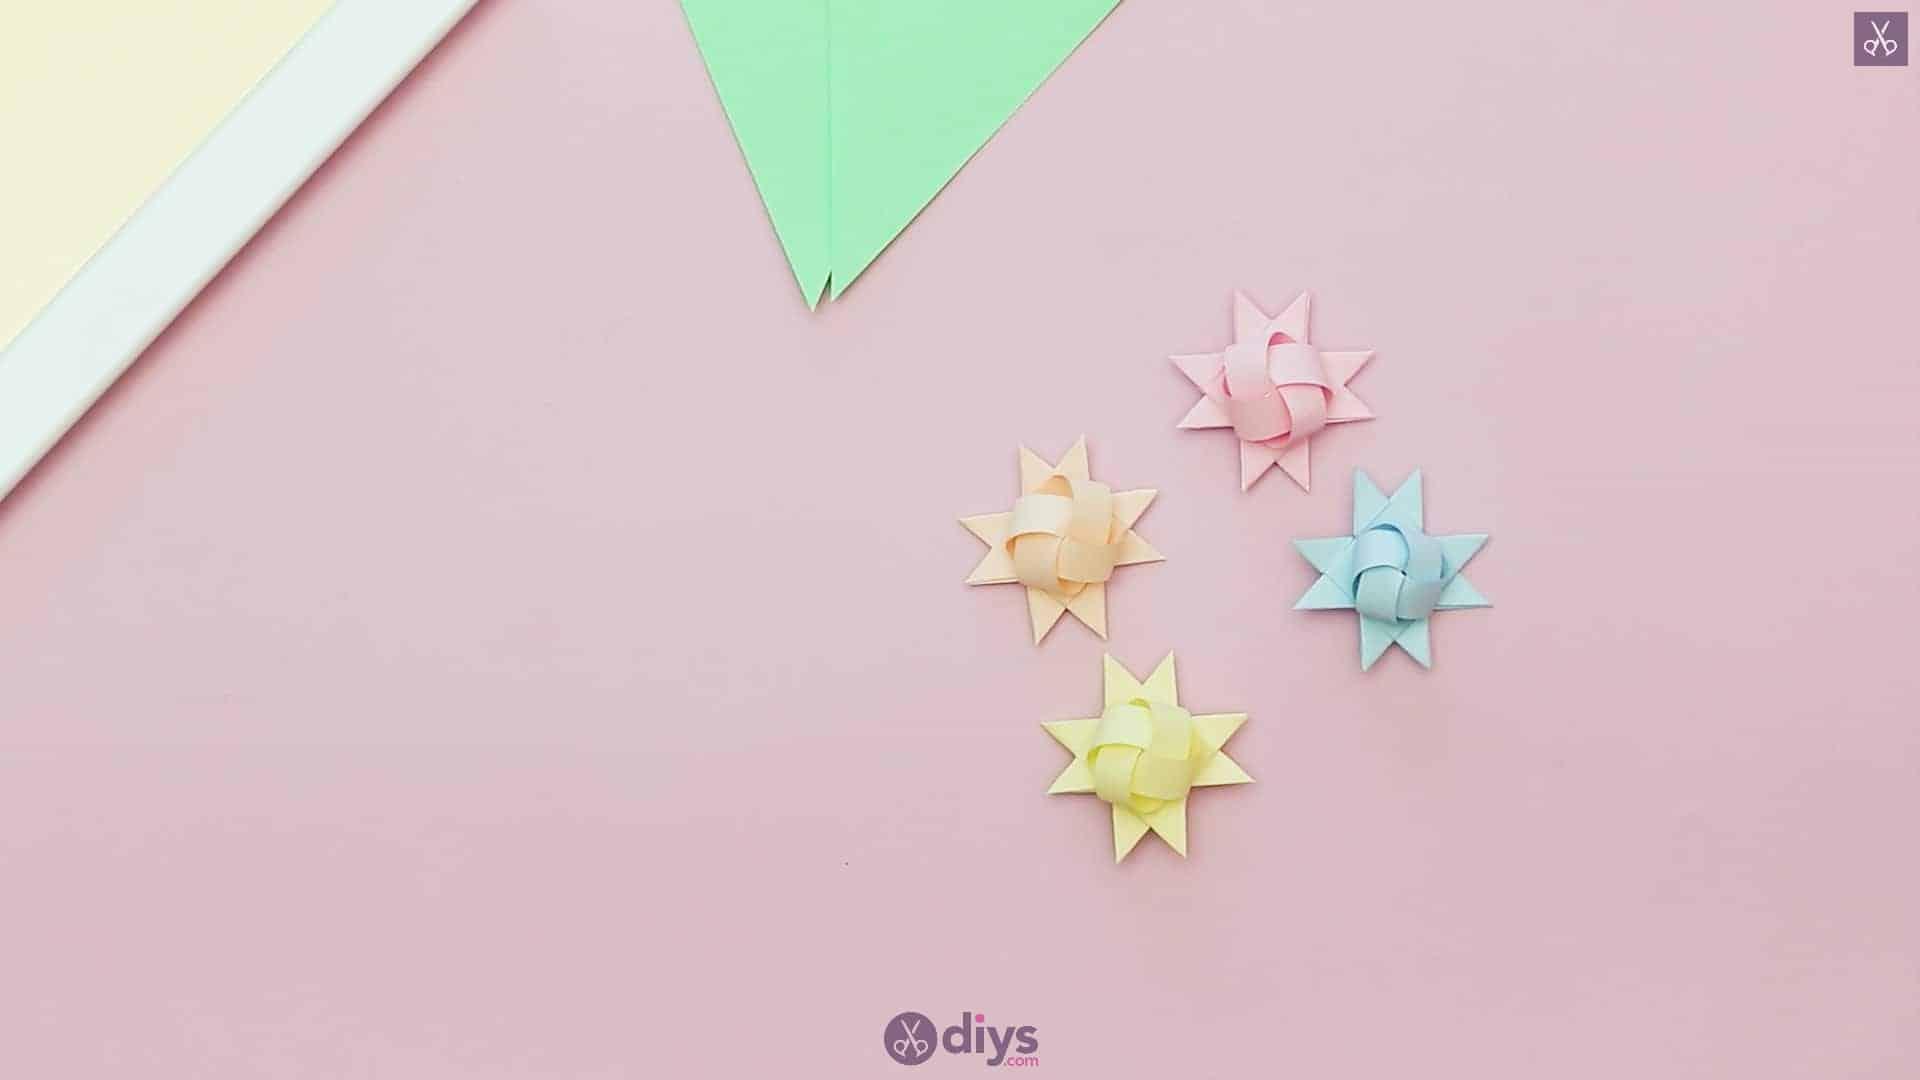 Diy origami flower art step 8c